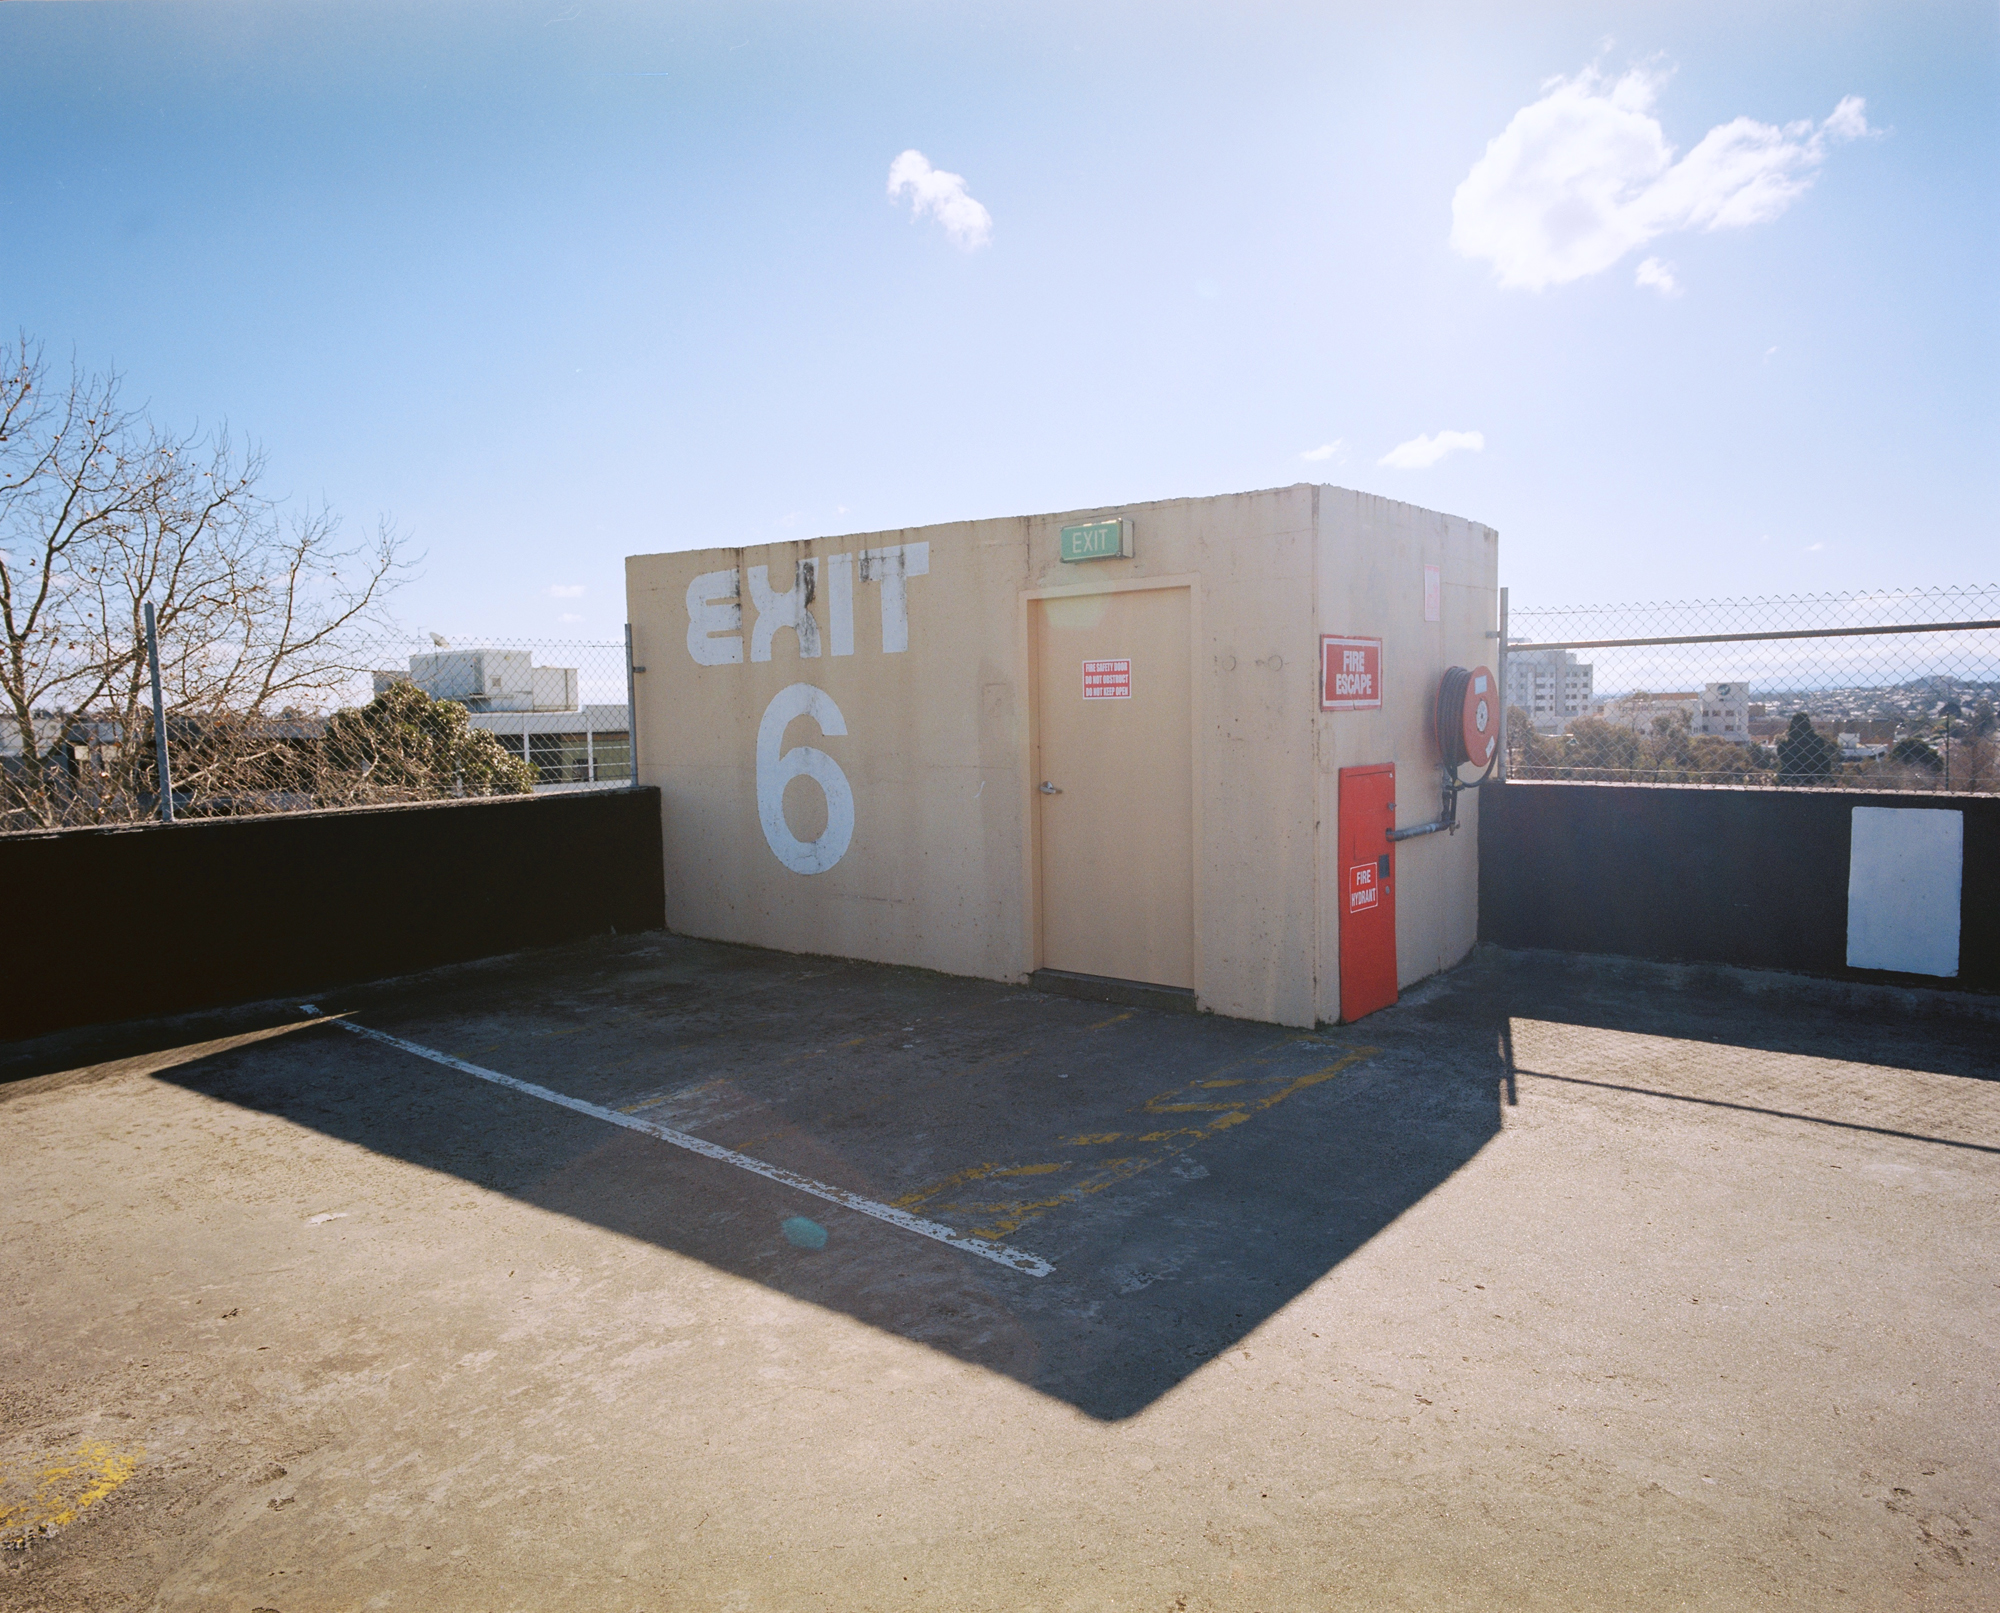 Exit 6